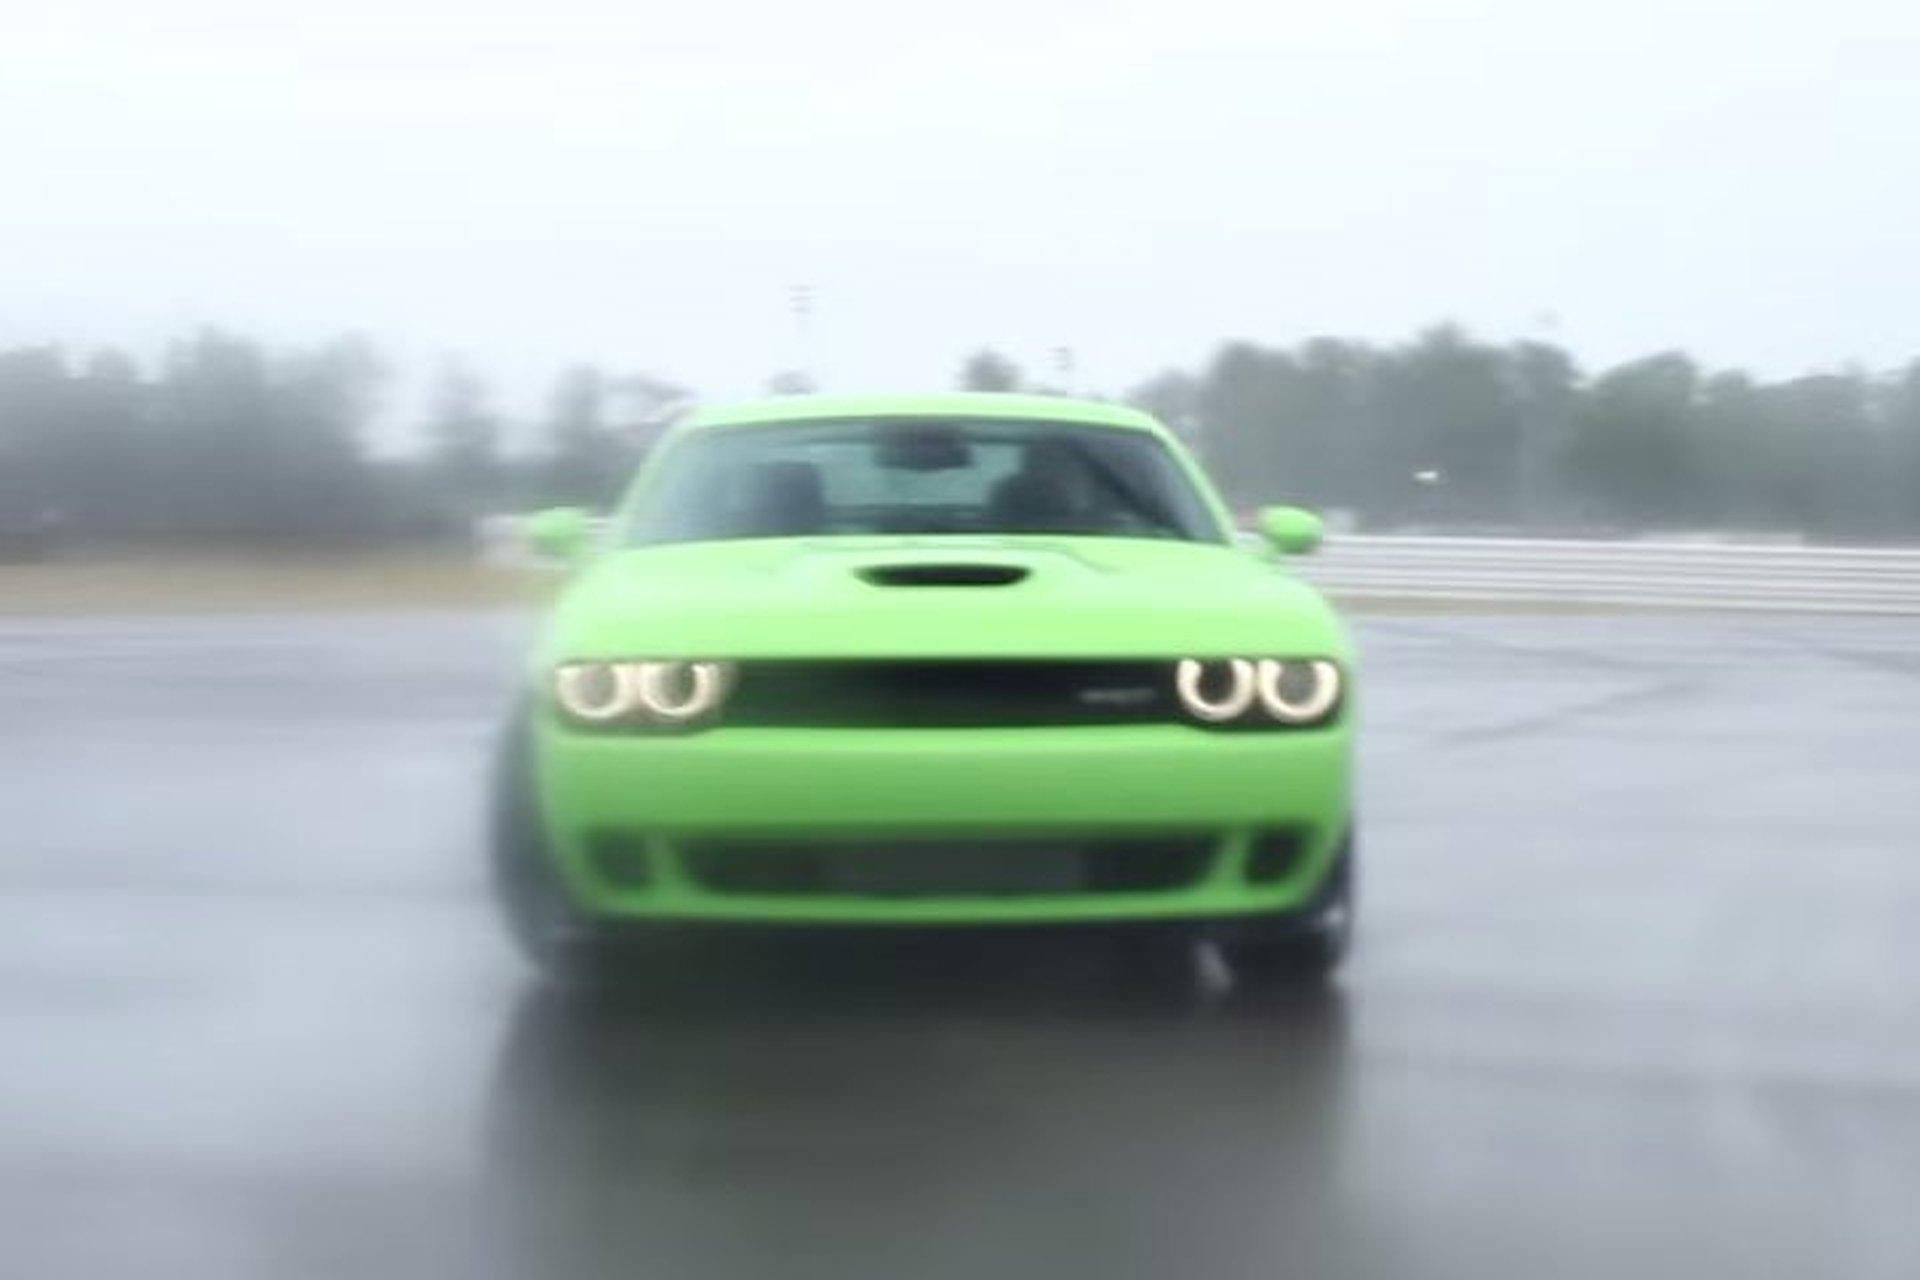 Matt Farah Gets Sideways in the Dodge Challenger Hellcat [Video]